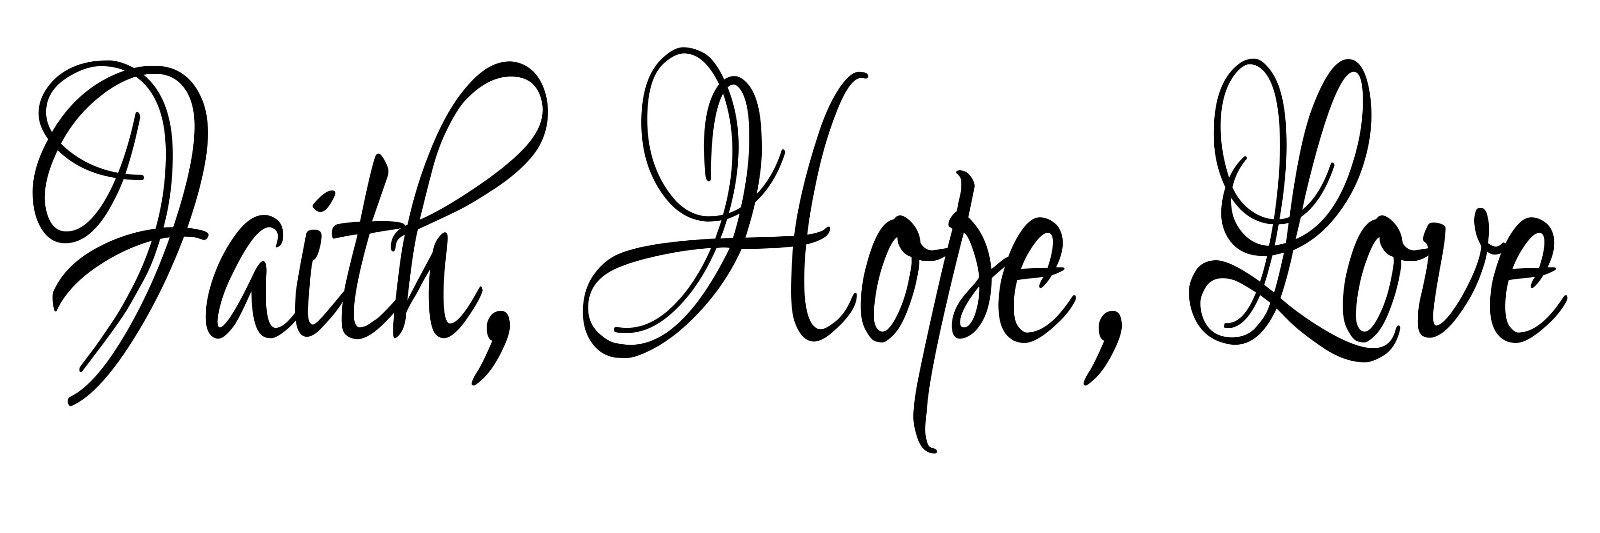 Love and hope clipart vector free stock Faith love hope decal clipart - ClipartFest vector free stock